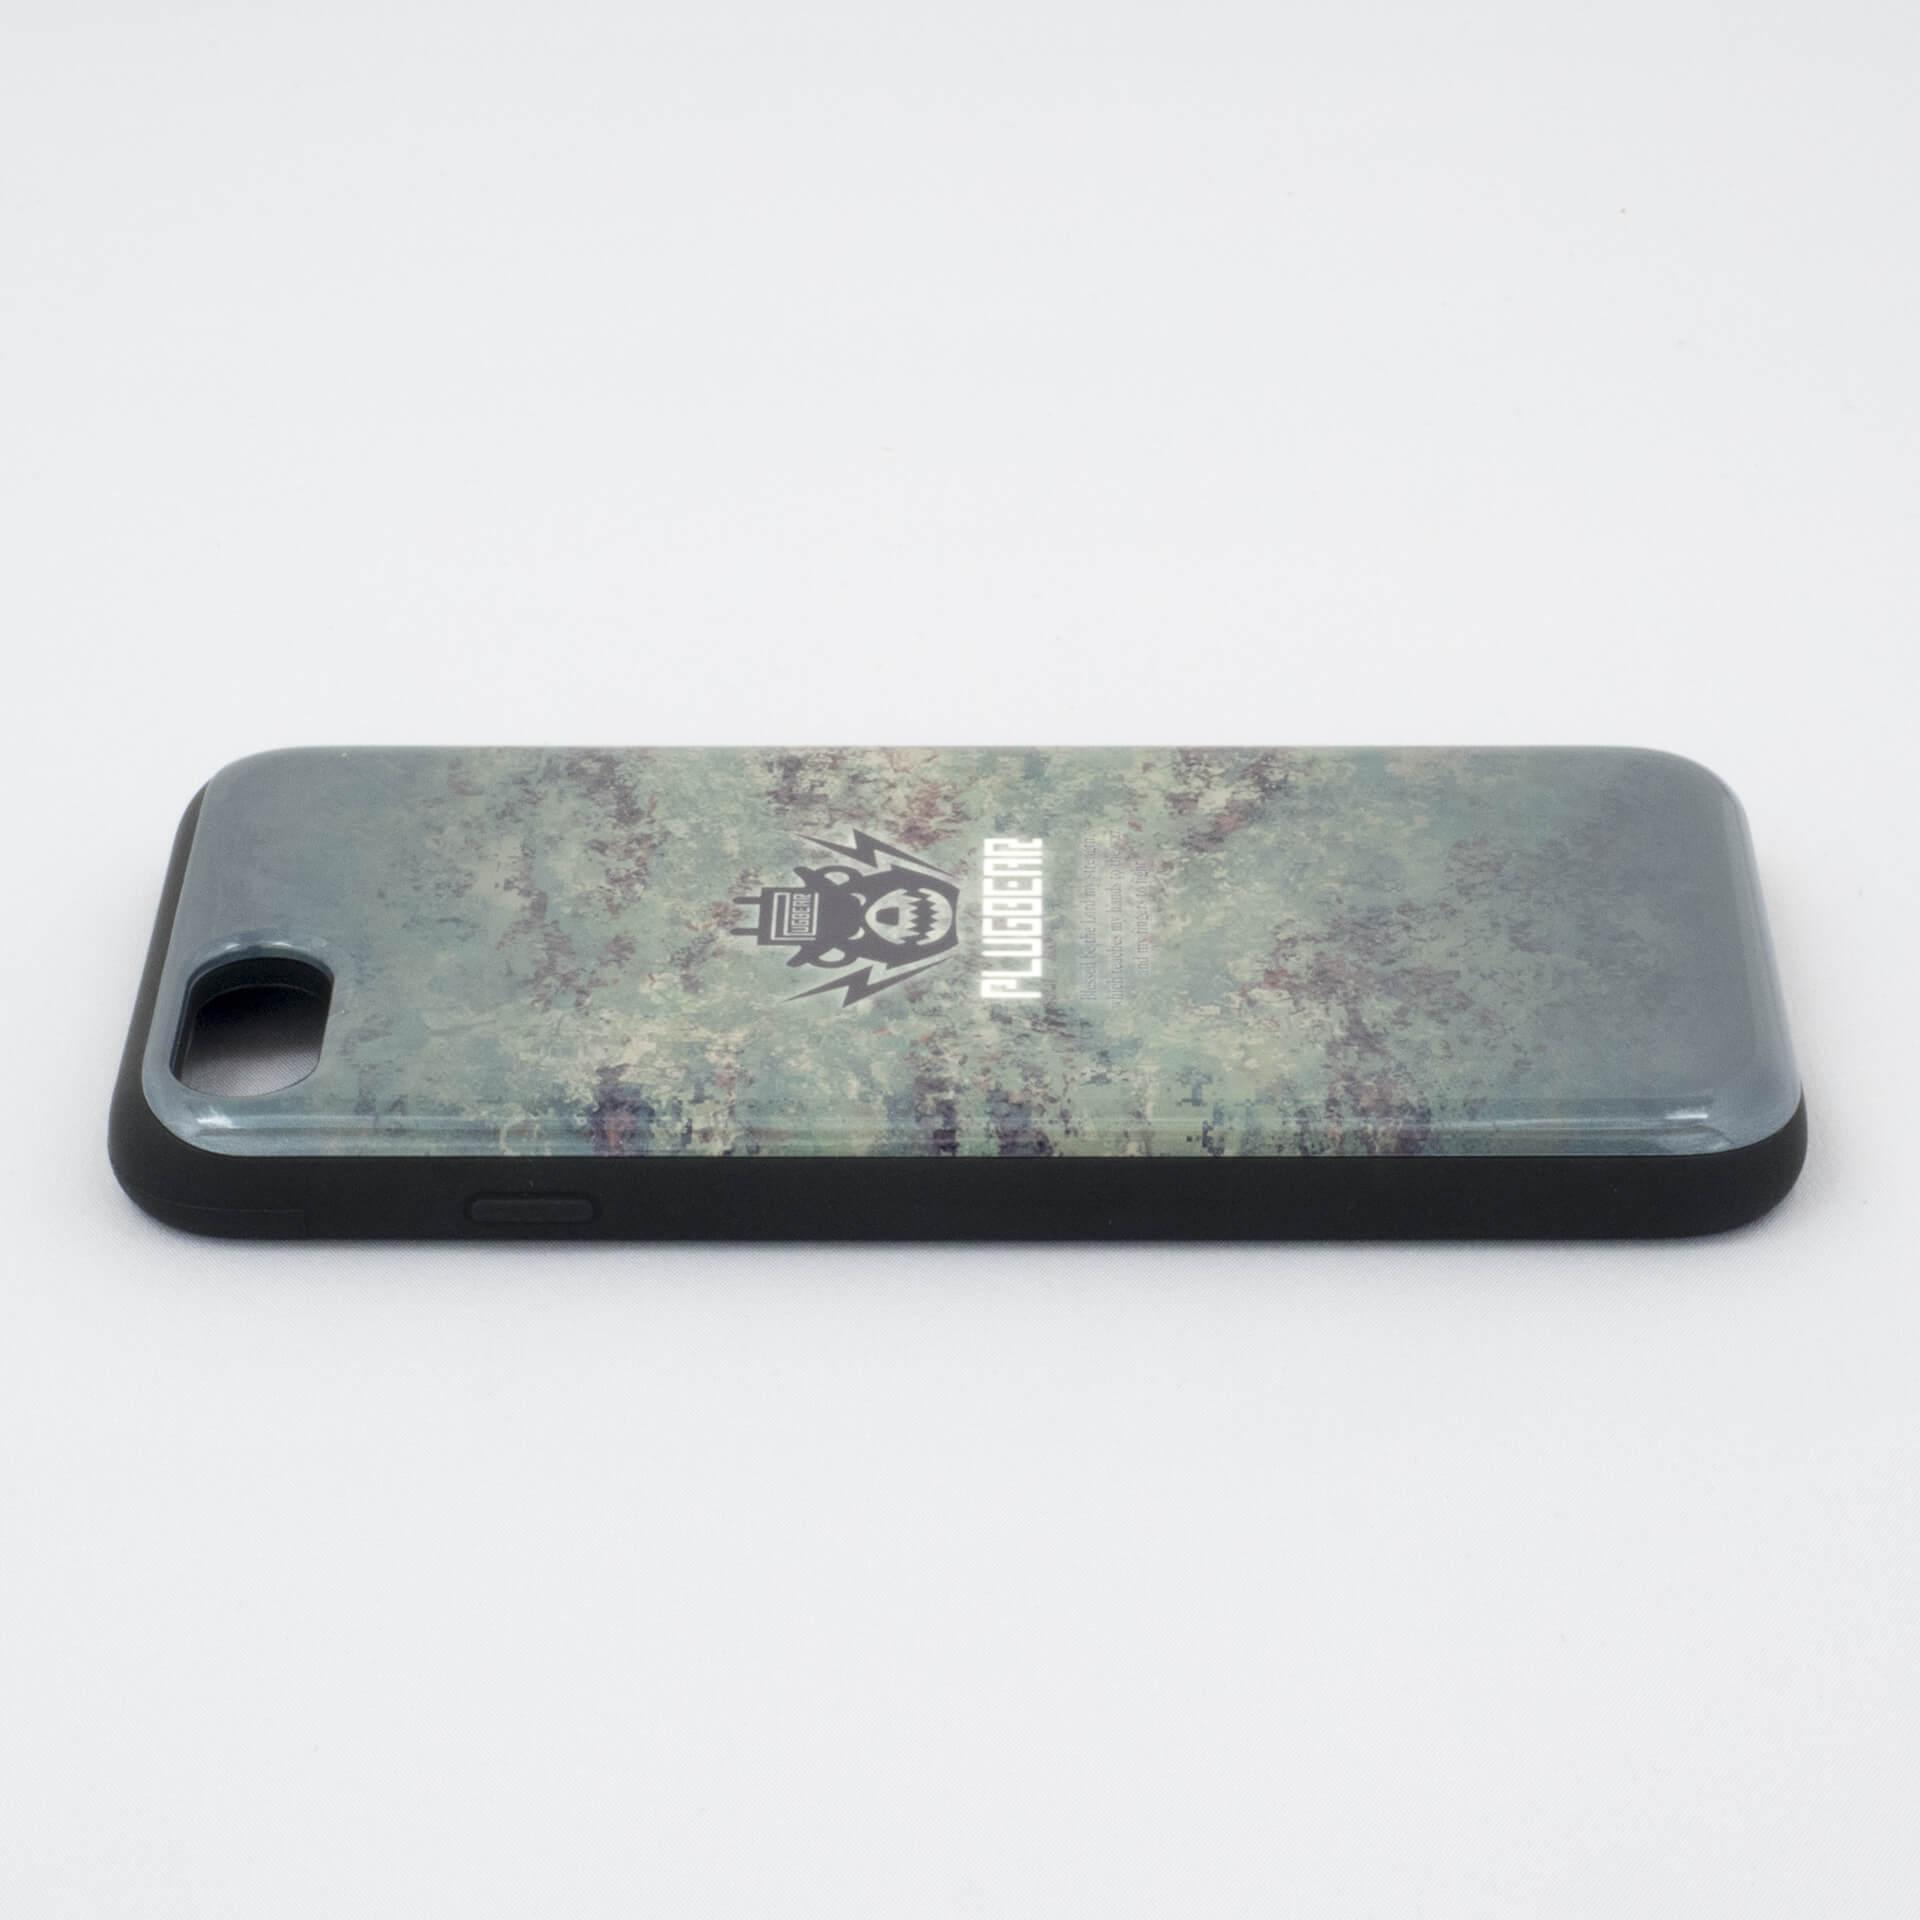 PLUGBEARのiPhoneケース画像2